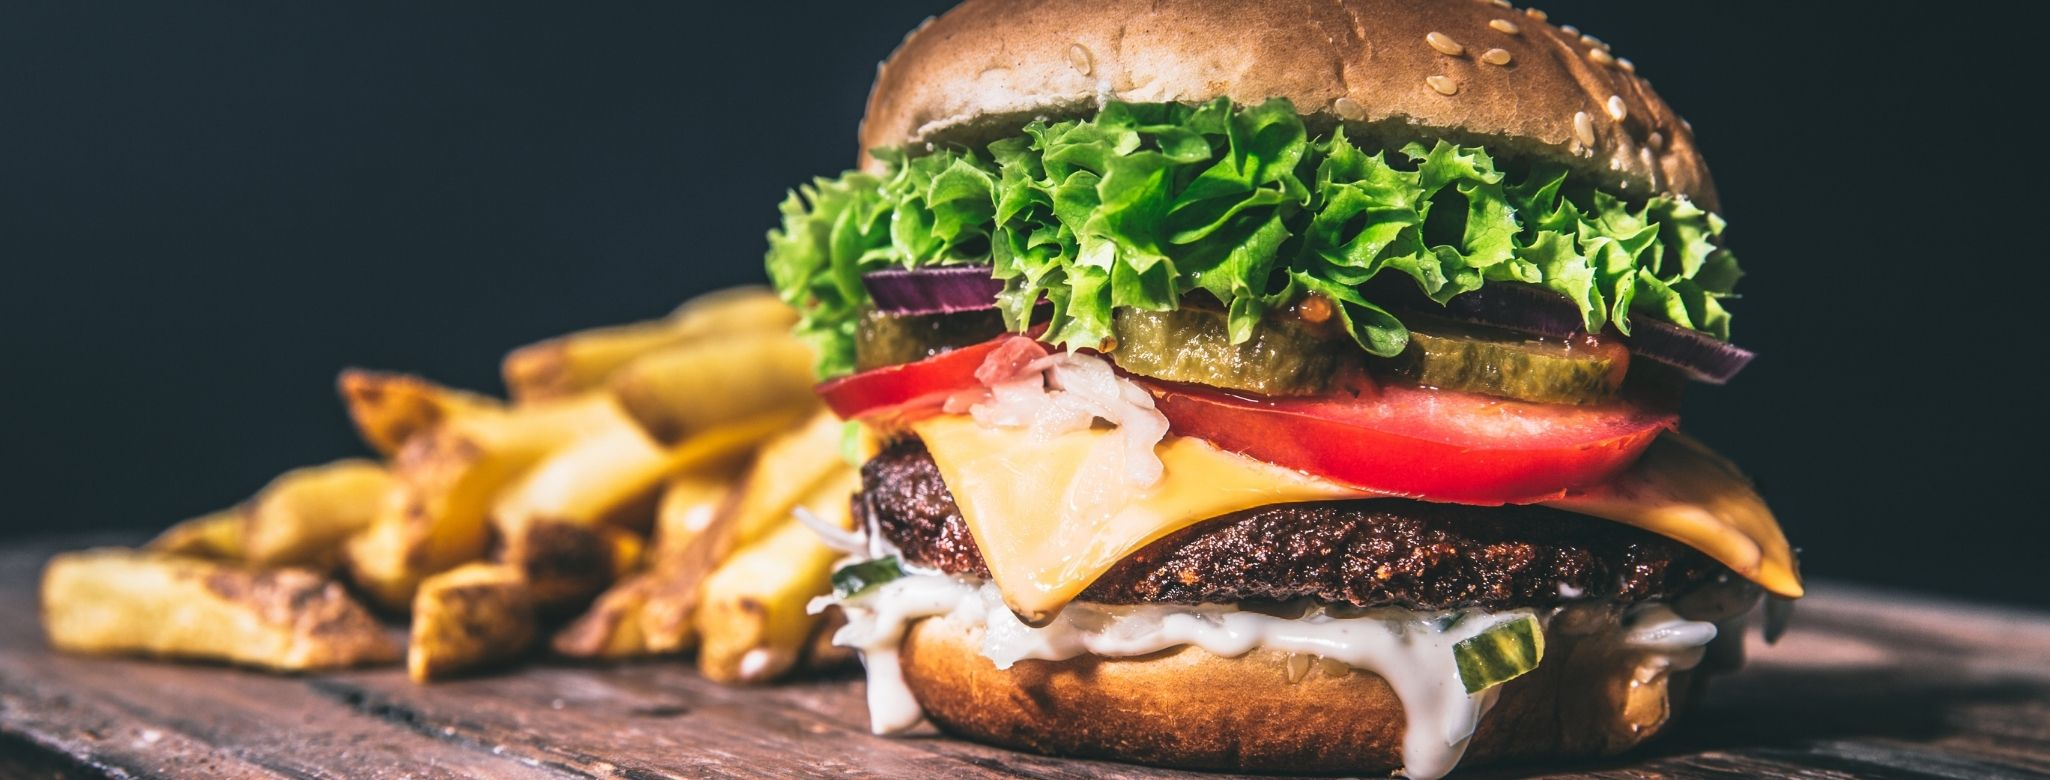 Photo d'un burger